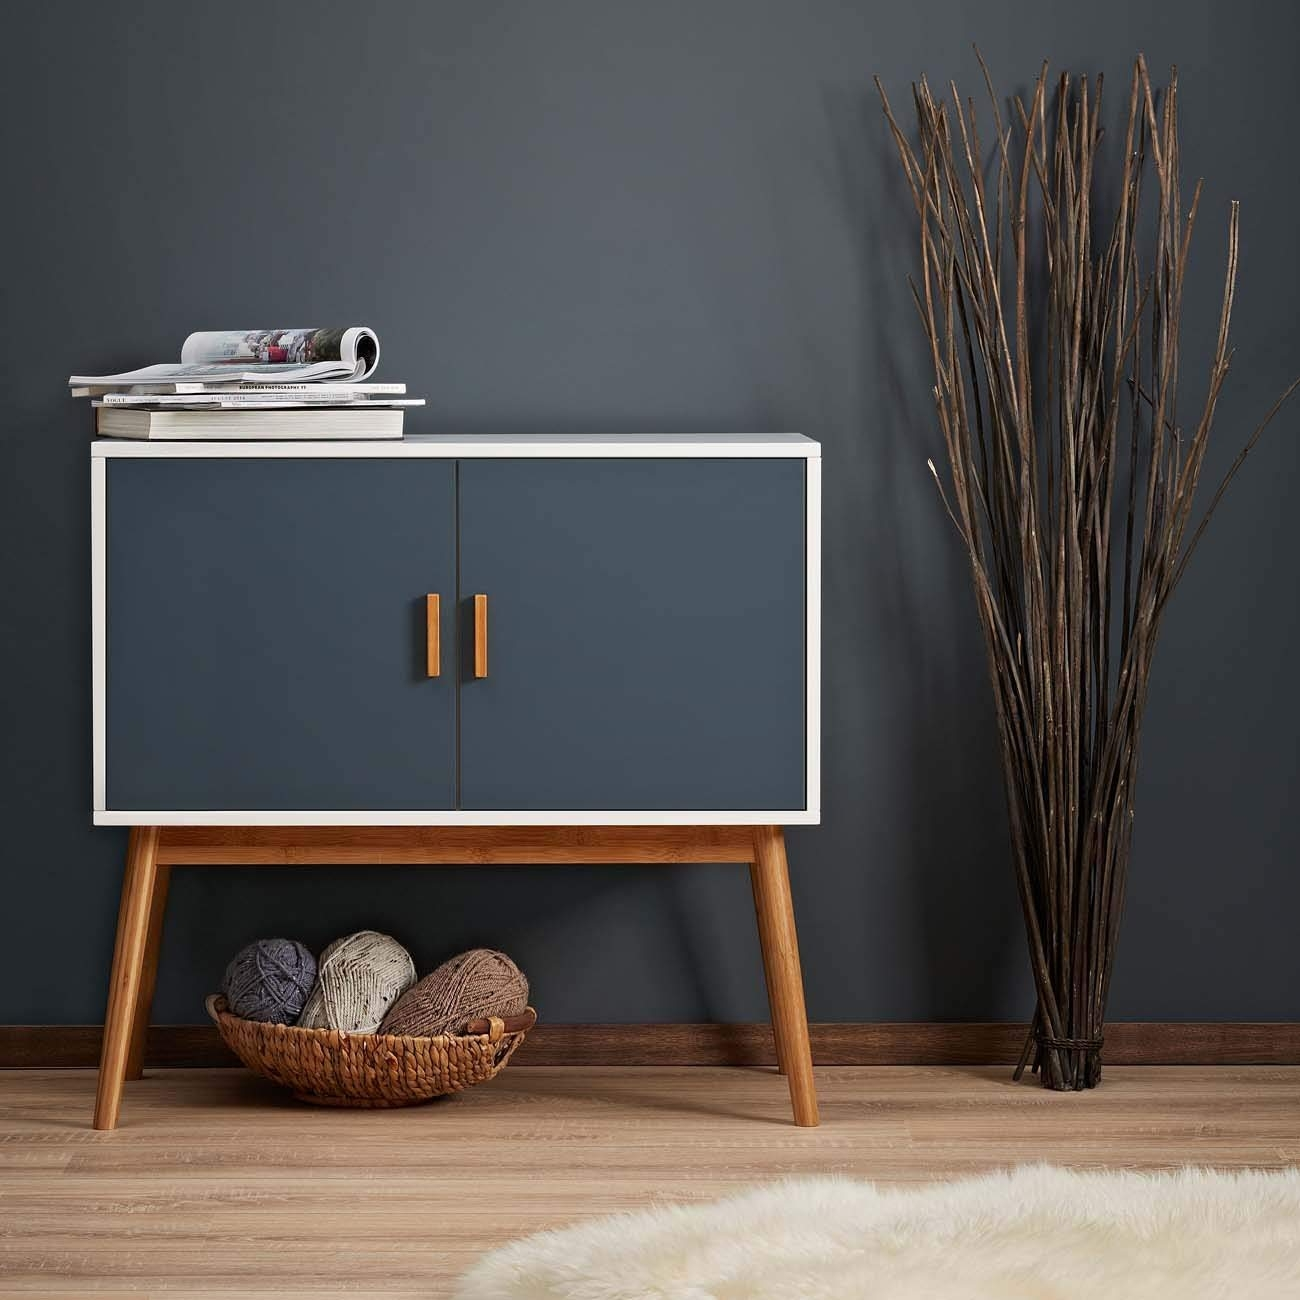 Retro Vintage Wooden Sideboard Storage Cabinet Doors Grey